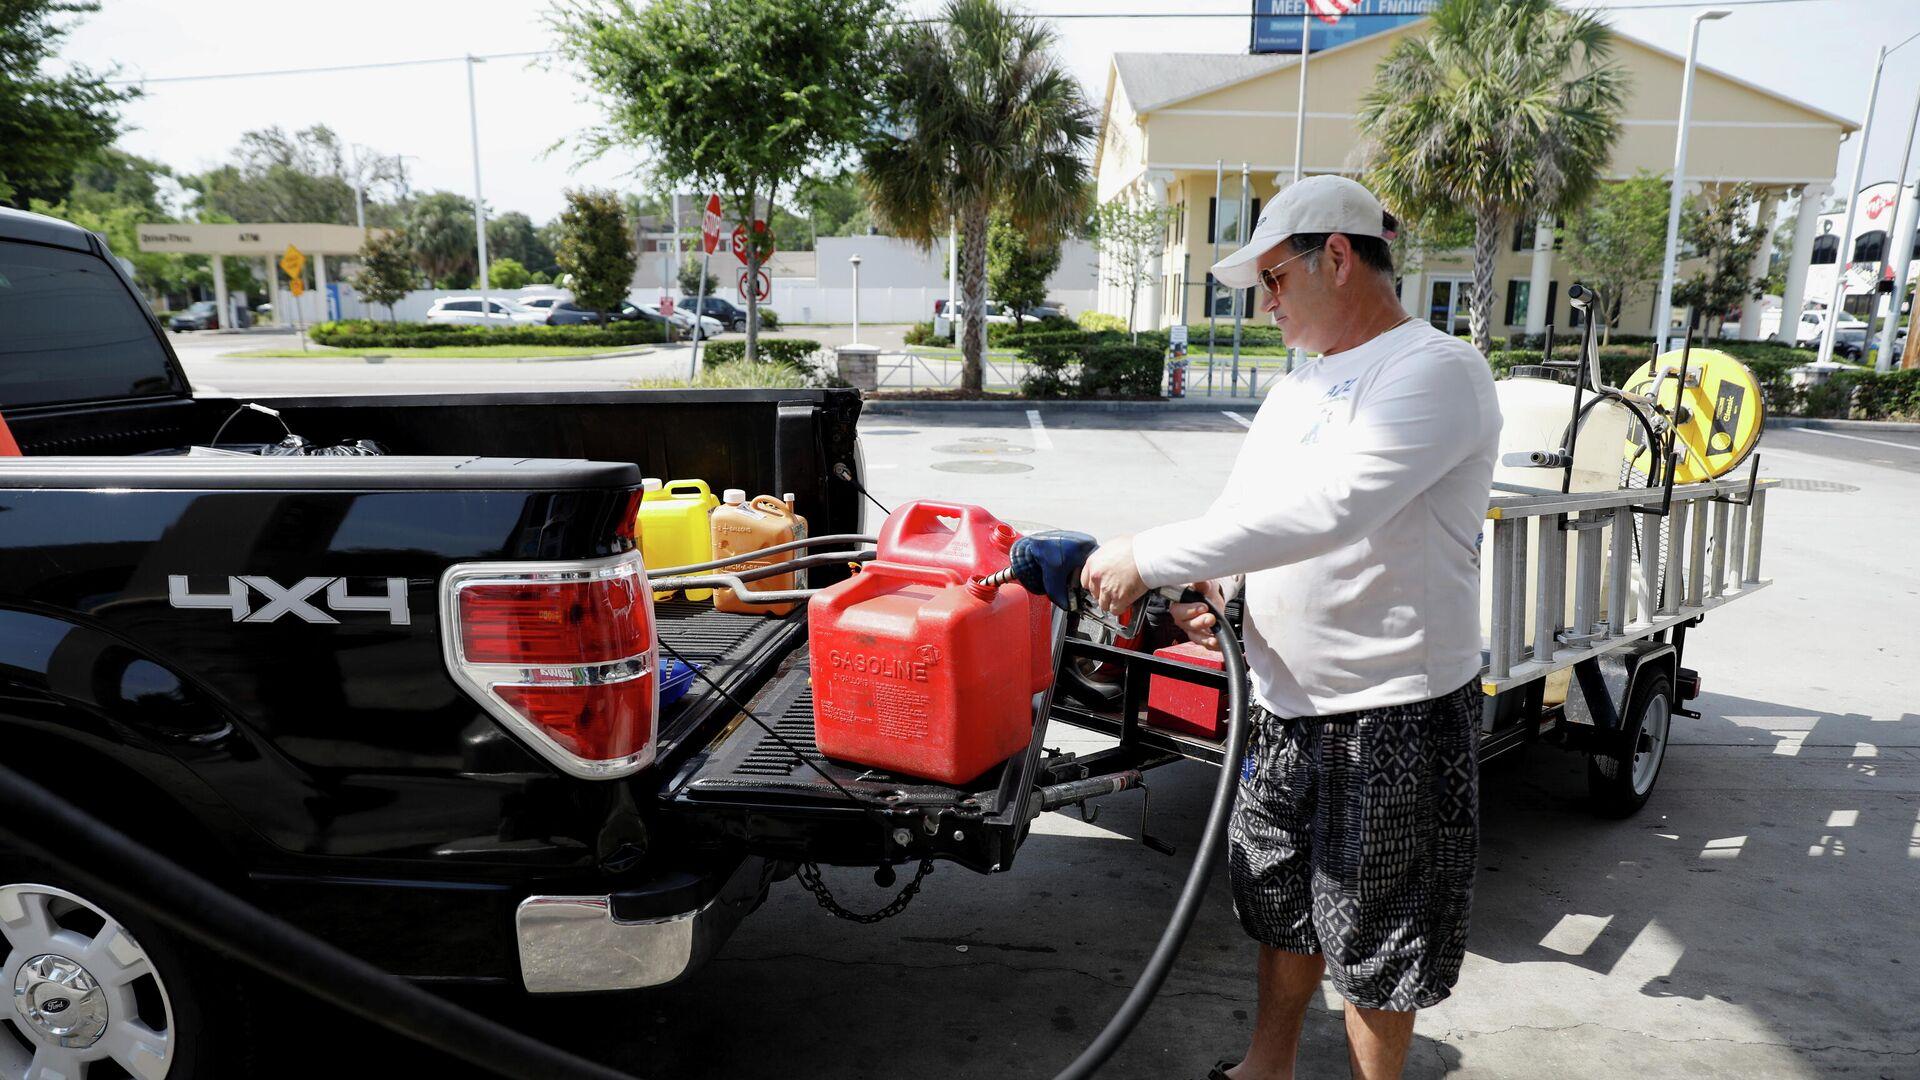 Мужчина наполняет канистры топливом после кибератаки на трубопровод компании Colonial Pipeline в Тампе, Флорида, США - РИА Новости, 1920, 13.05.2021